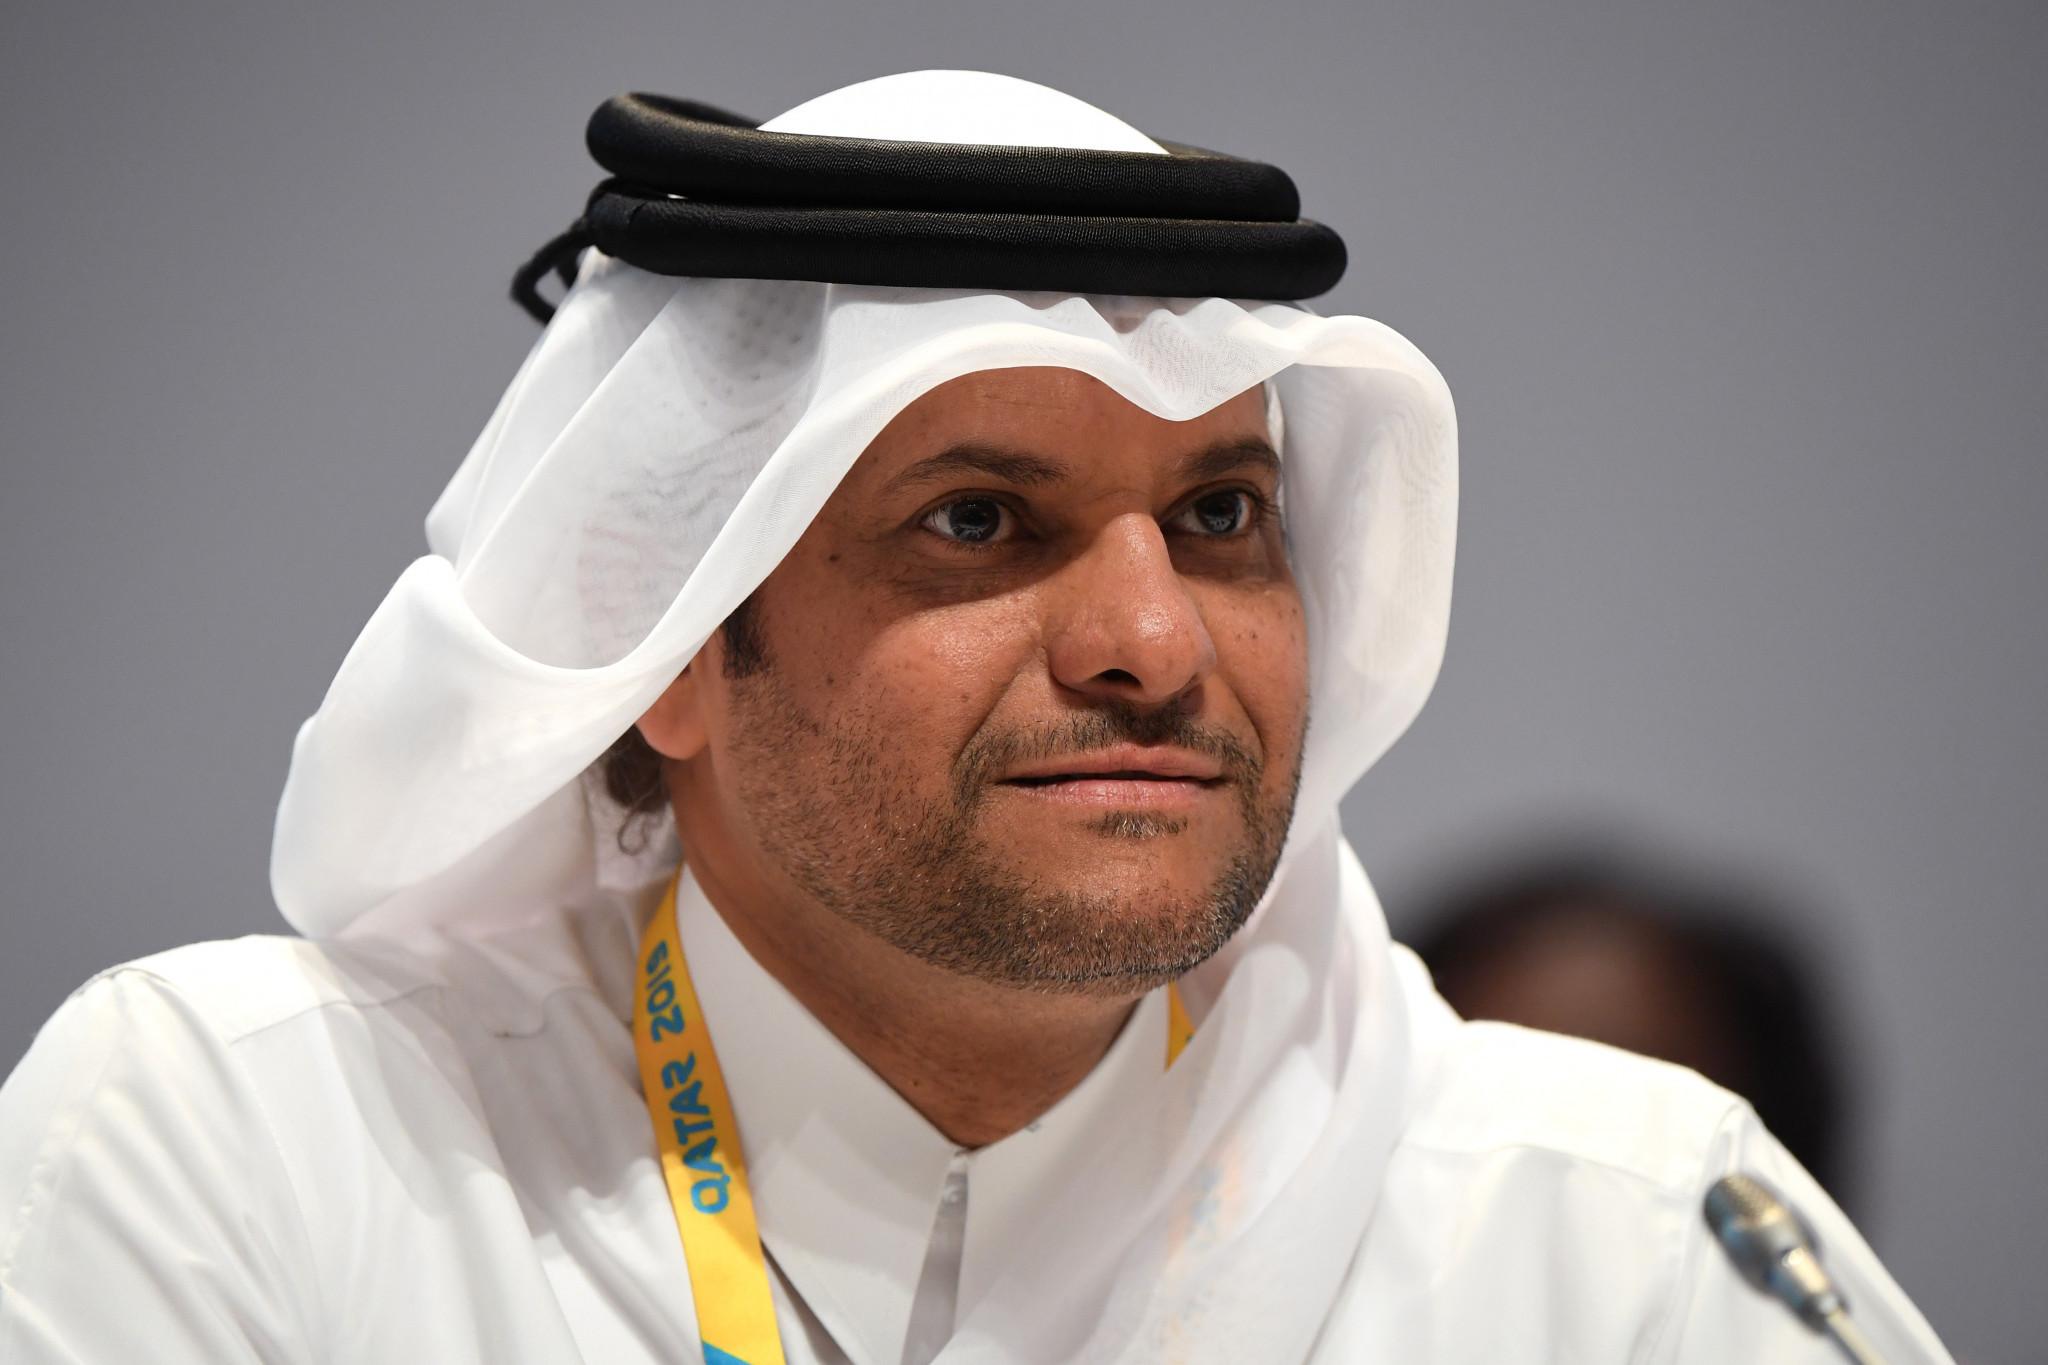 Qatar's Sheikh Saoud Bin Abdulrahman Al-Thani was among those looking on ©Getty Images